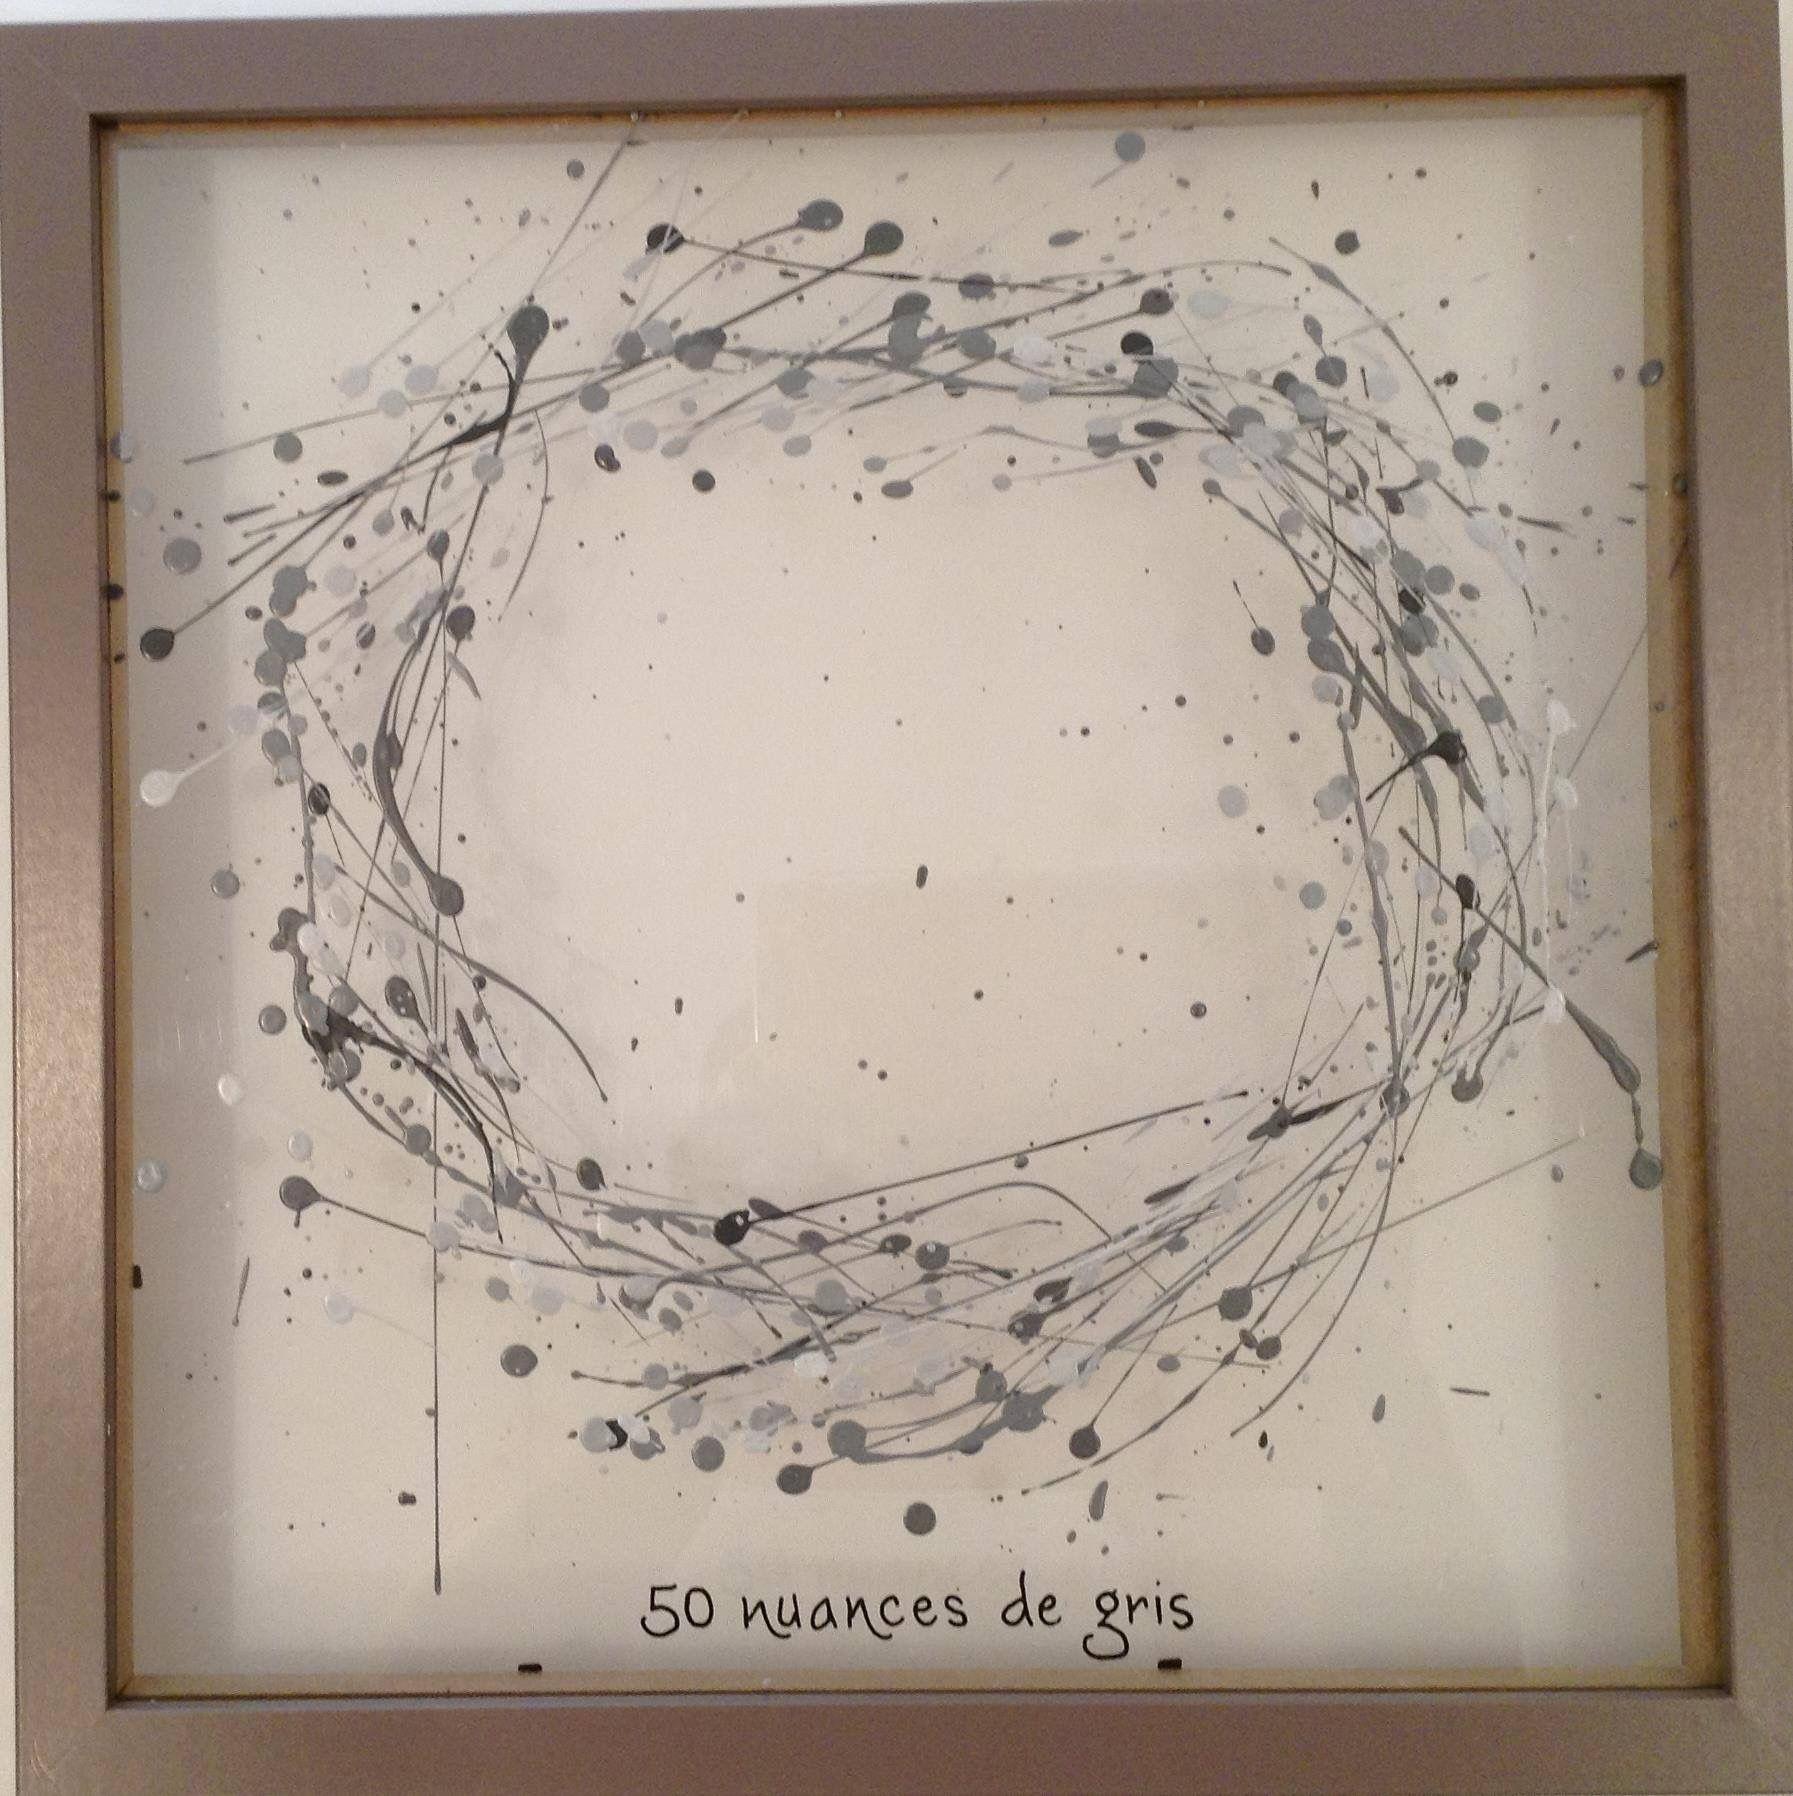 Pin by Andris Heidemanis on Stikla apgleznošana | Pinterest